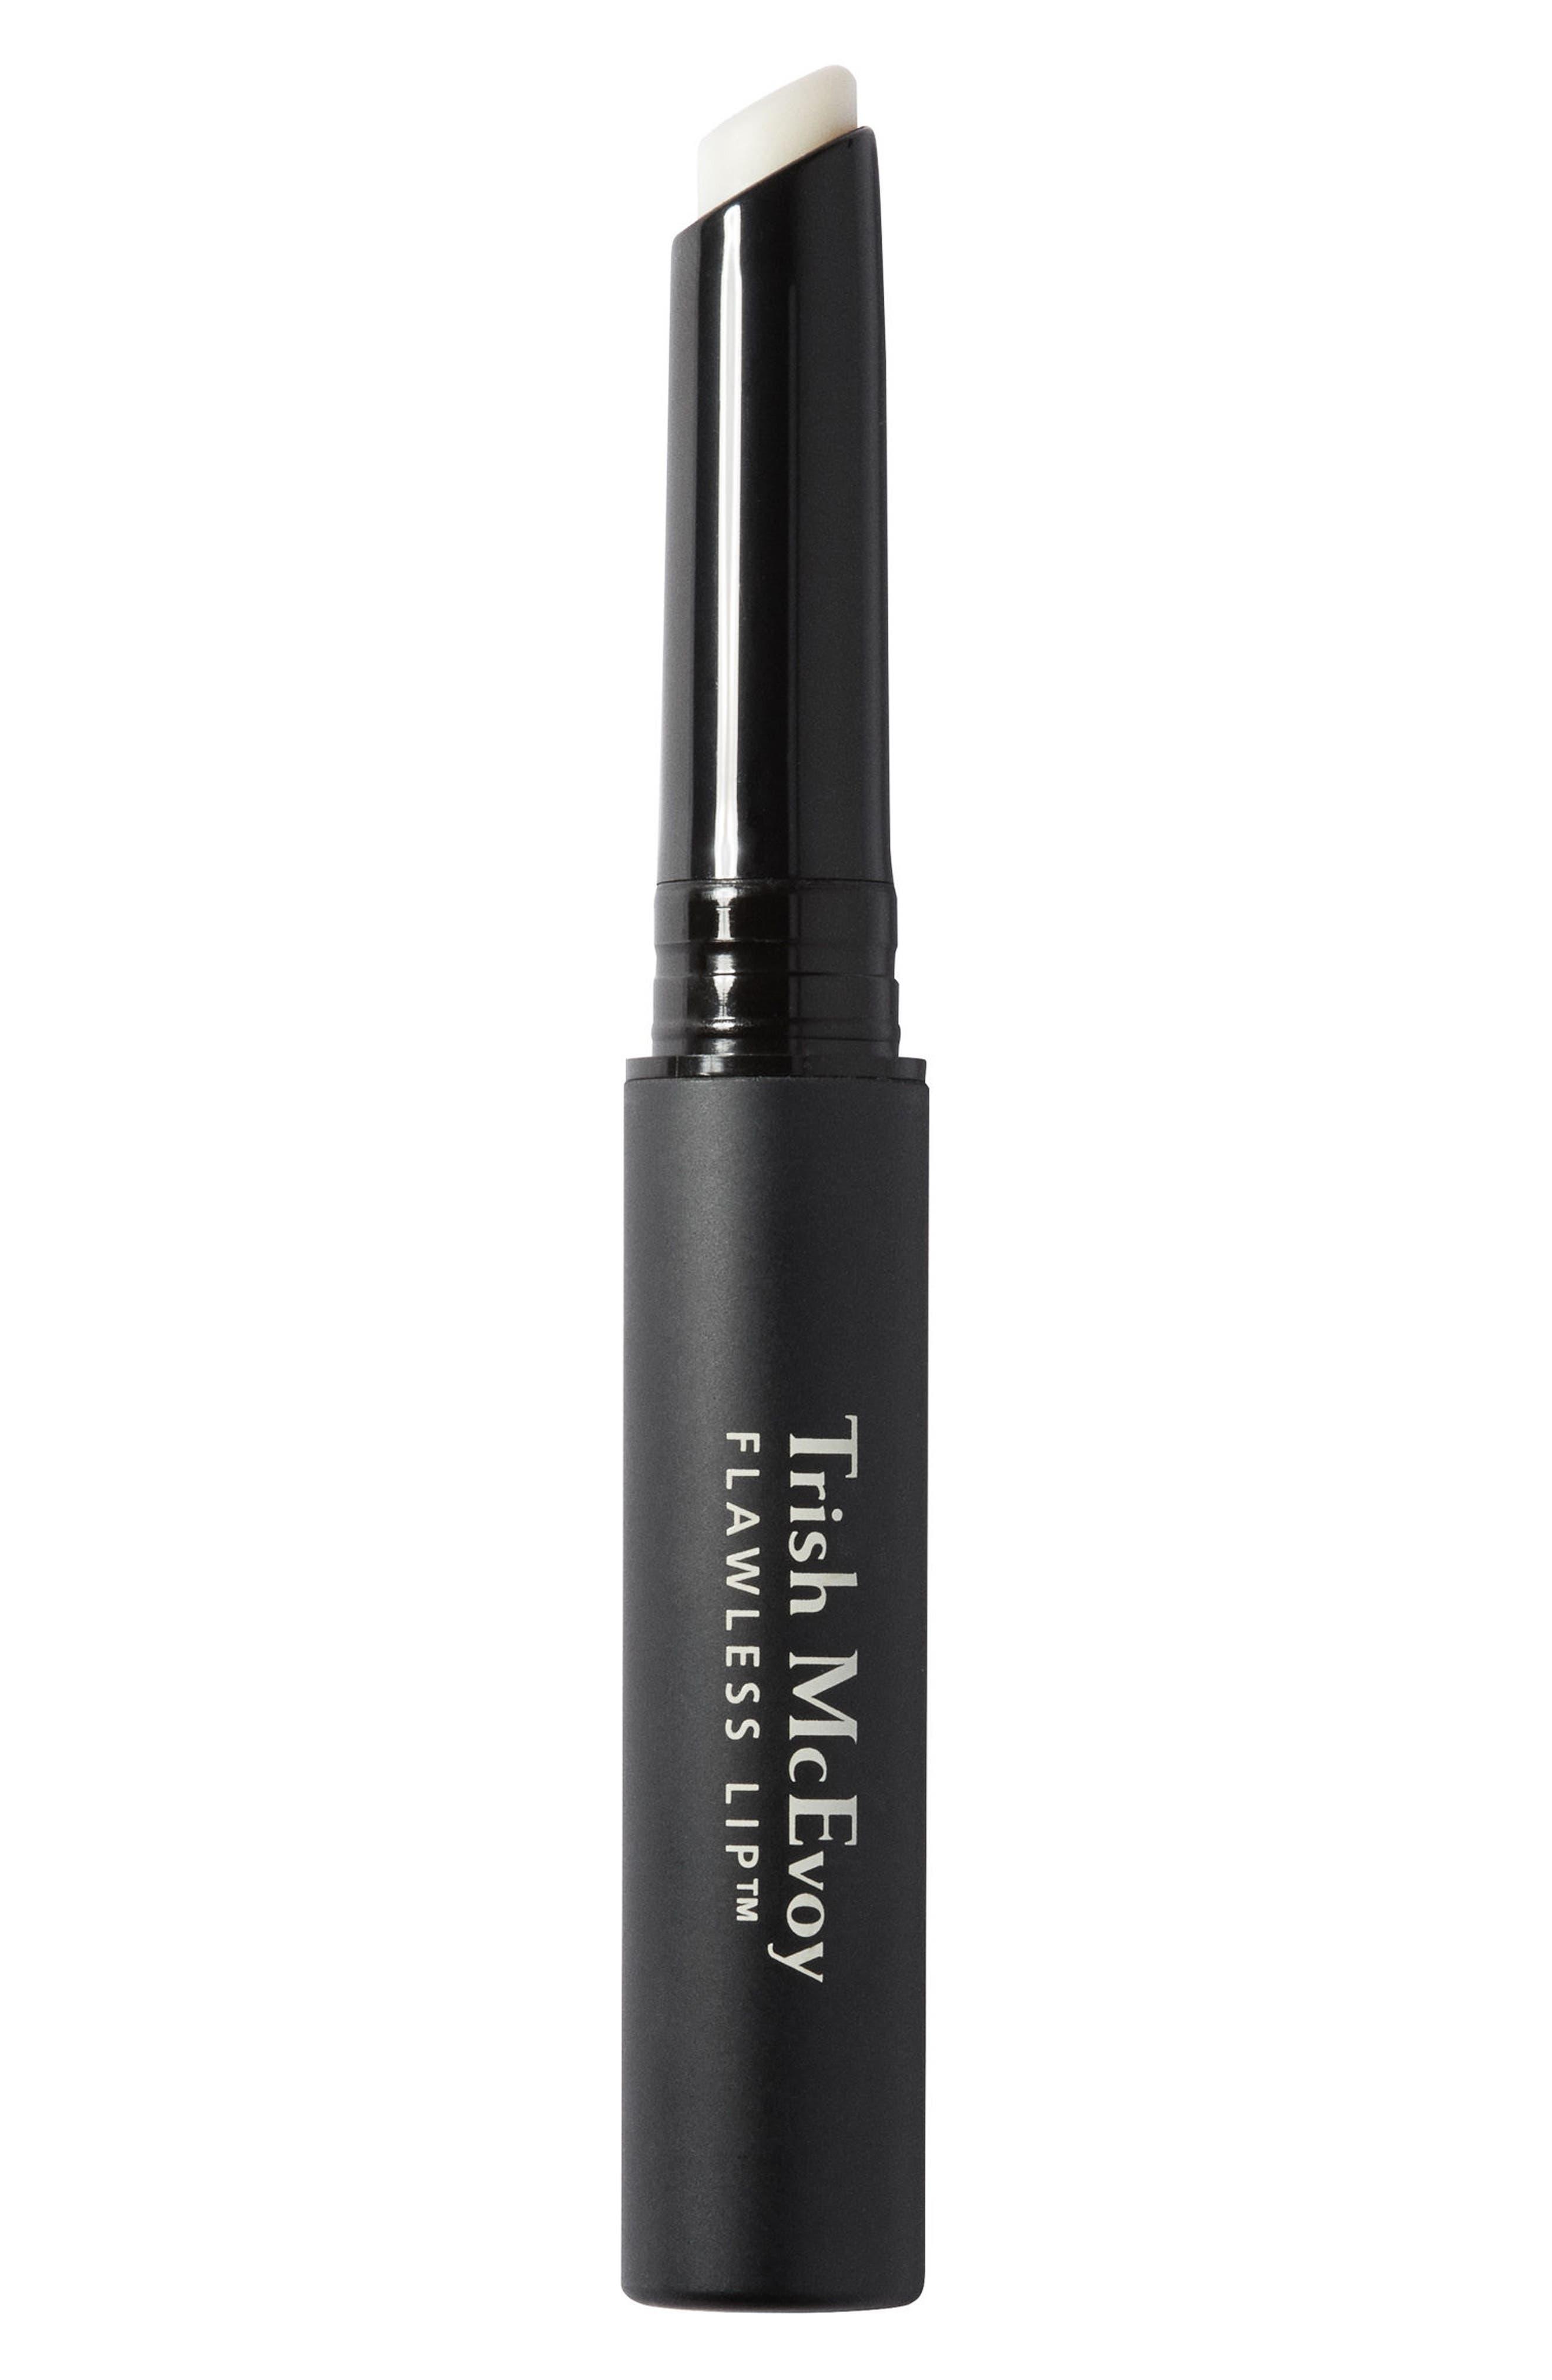 Trish McEvoy 'Flawless Lip' Primer